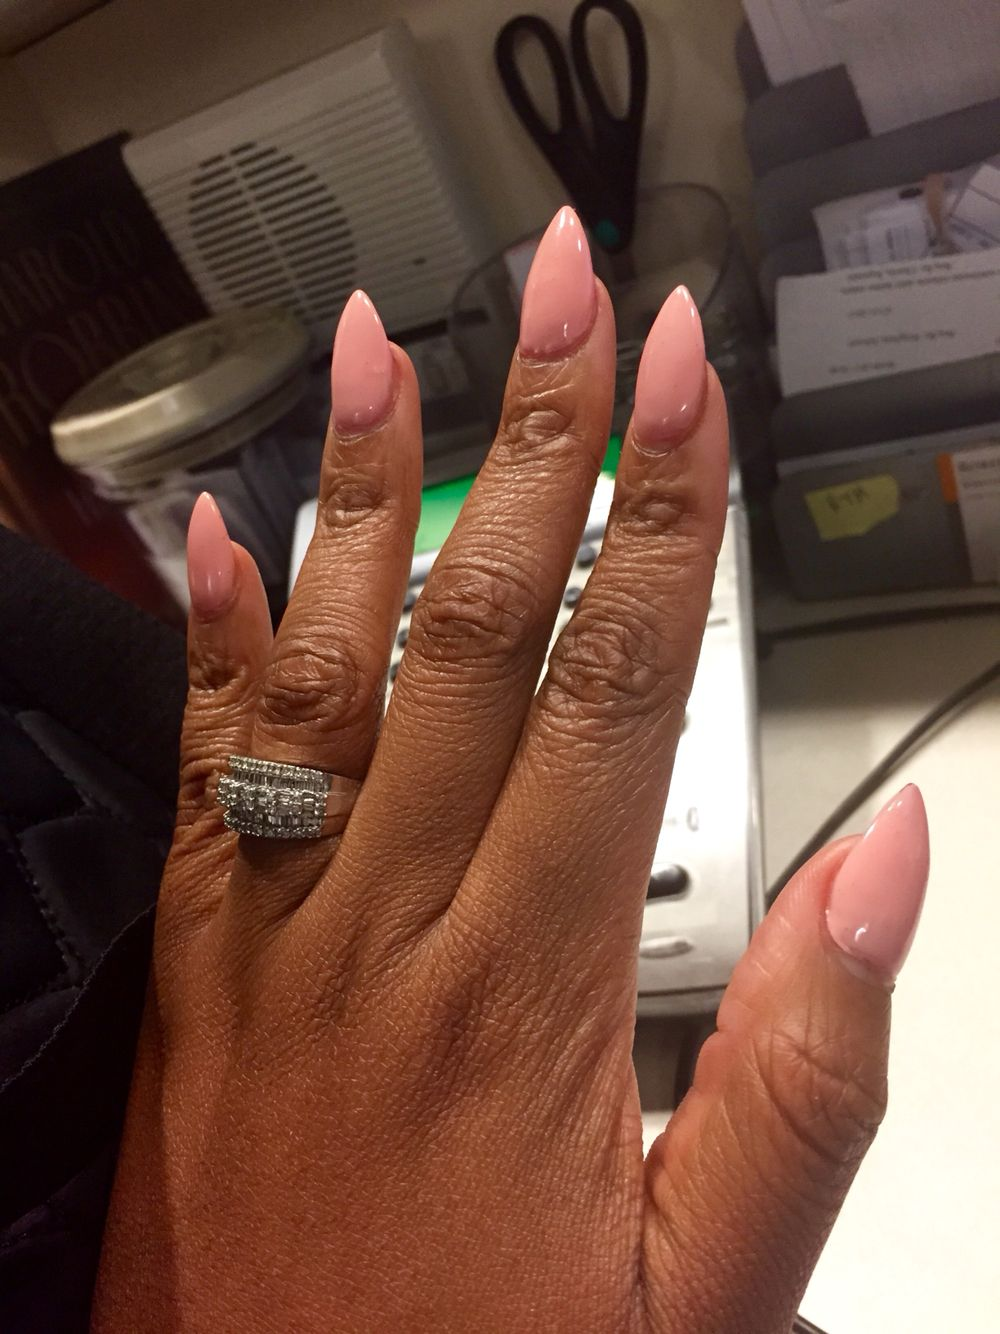 Cuccio Life S A Peach Gel Color Nails To Go Gel Color Nail Colors